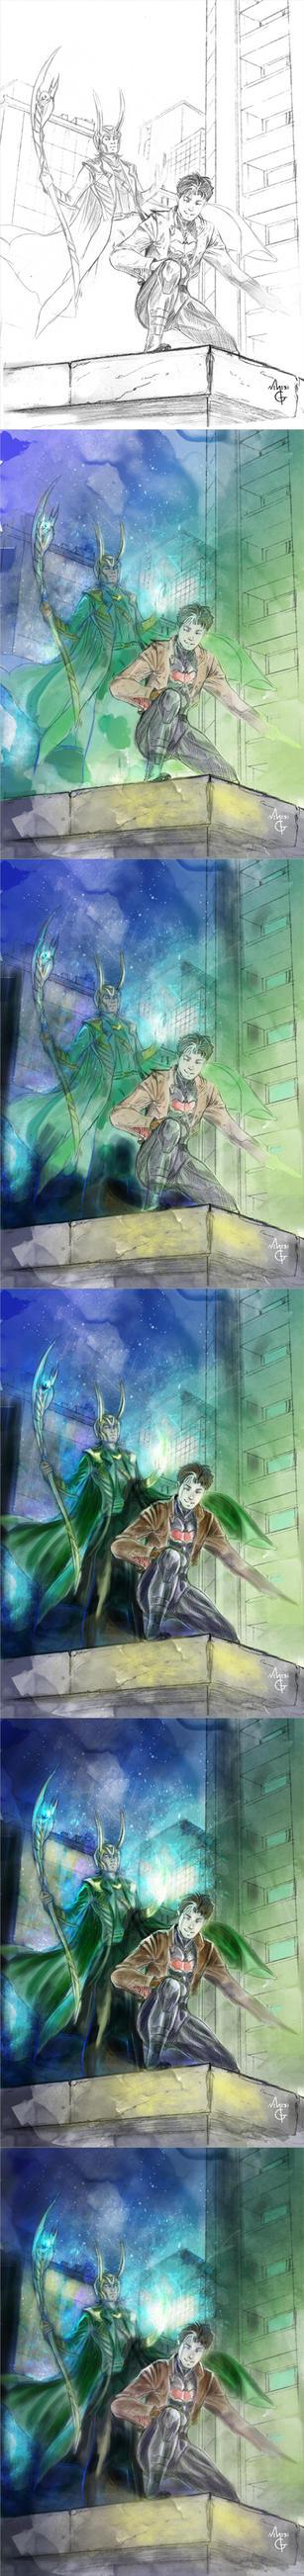 WTmA -Visual Step by Step by MGNemesi